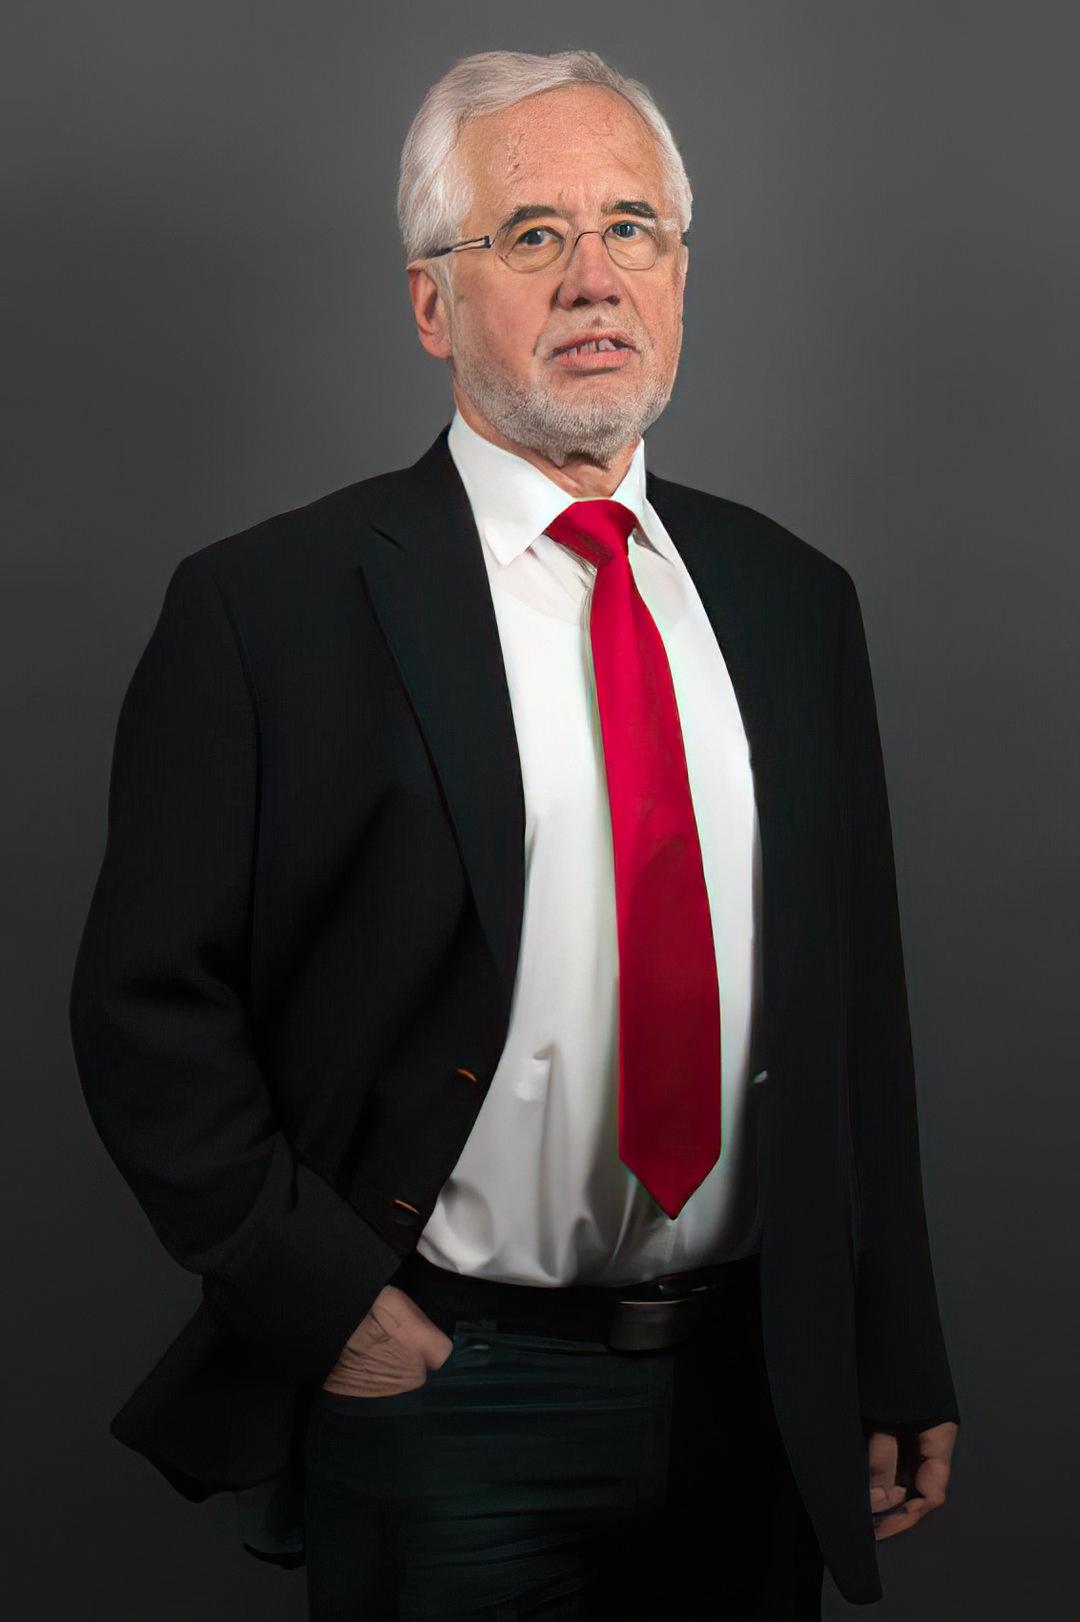 Werner Schoofs